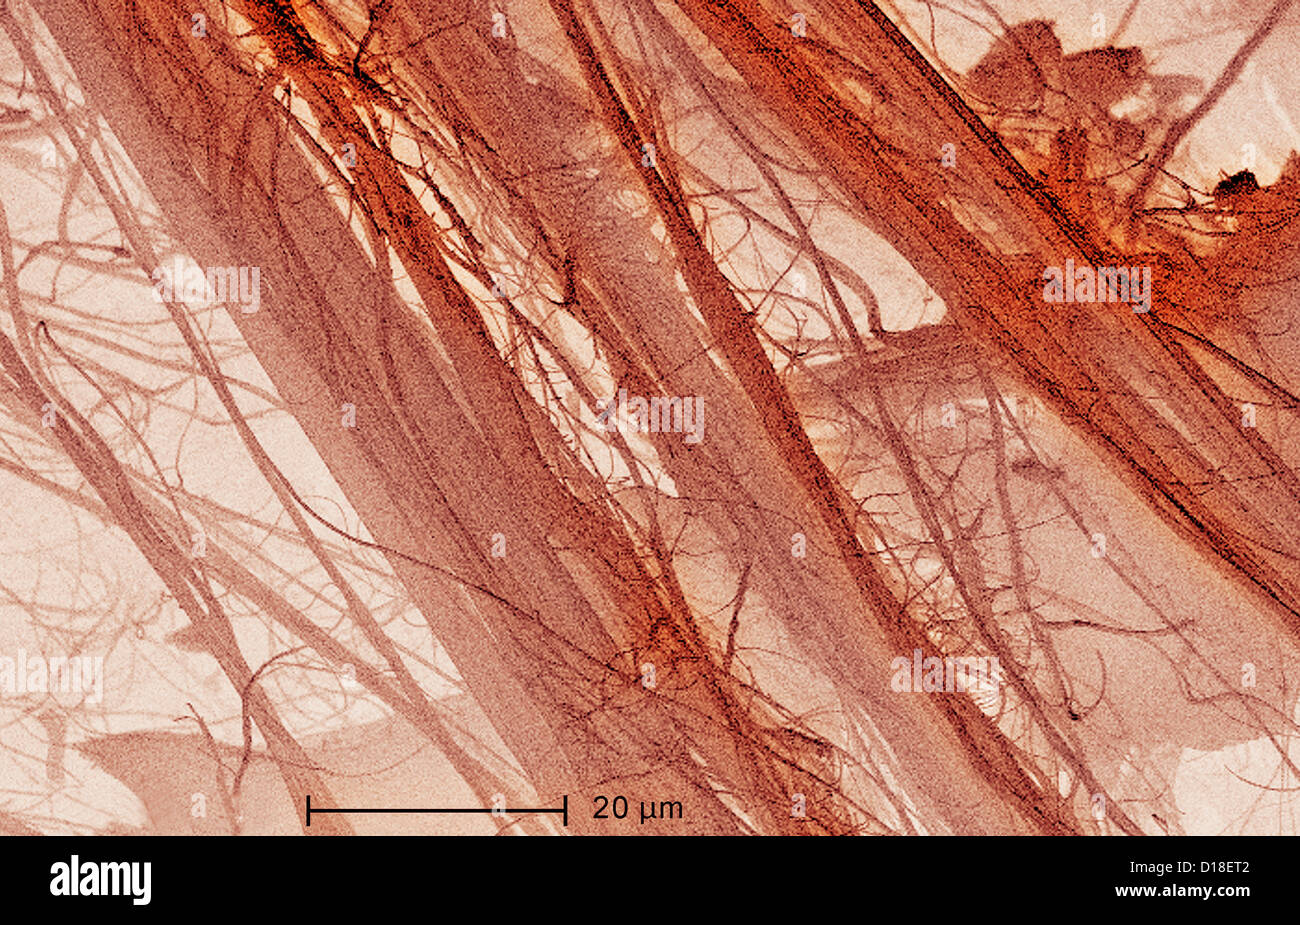 Scanning Electron micrograph of  asbestos, 1200x - Stock Image